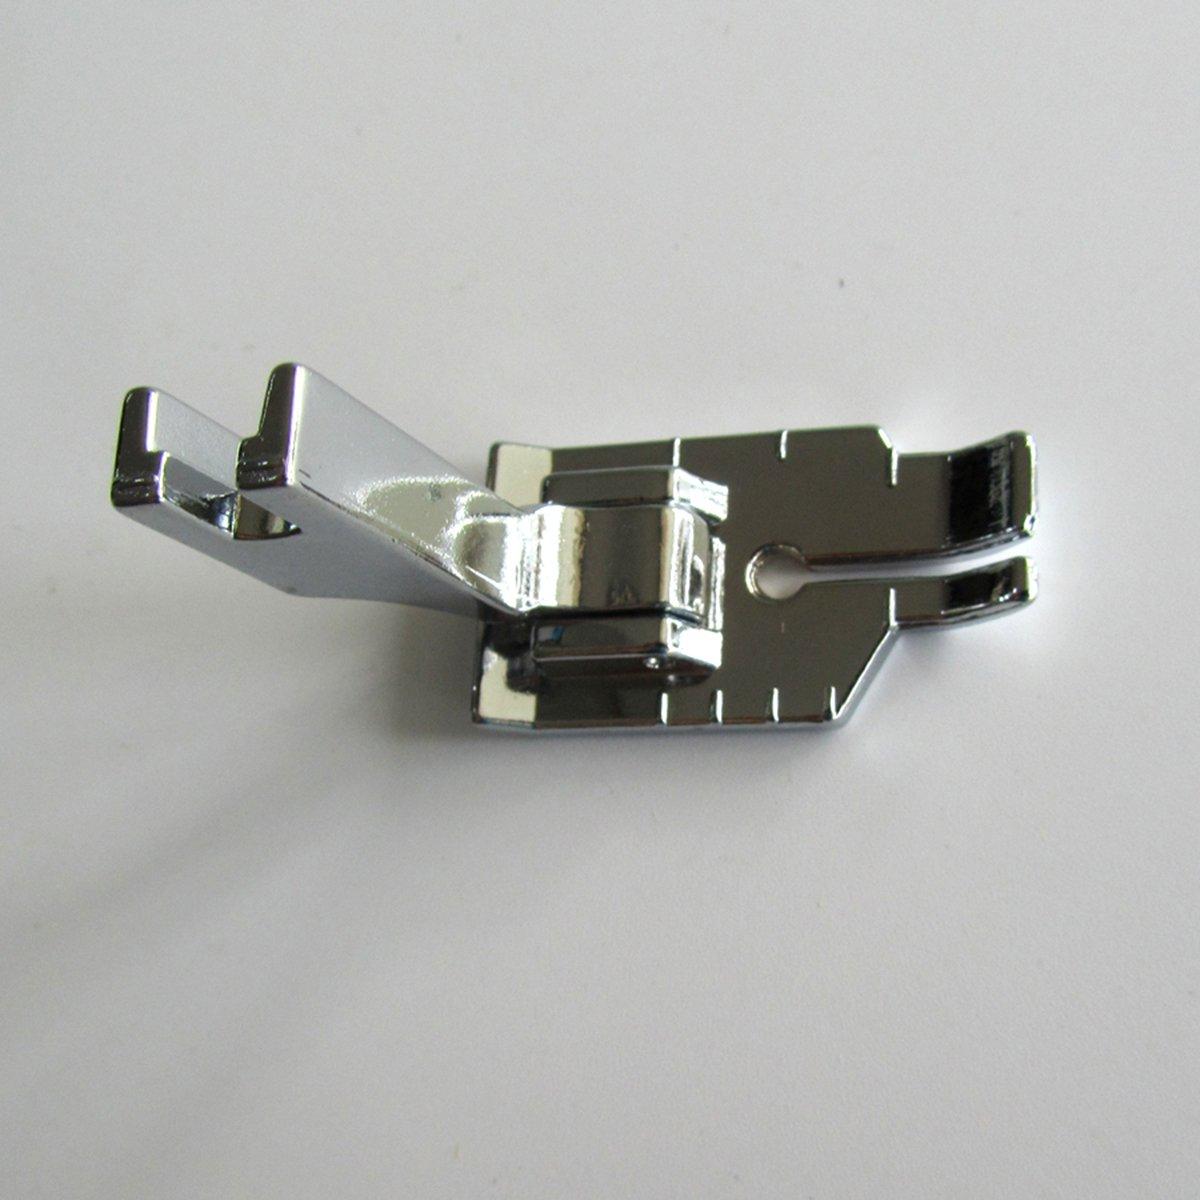 KUNPENG - #CY-7312H 2PCS 1/4(6mm) Metal Patchwork Quilting Foot High Shank for Babylock, Juki TL98Q, TL98QE, TL98E